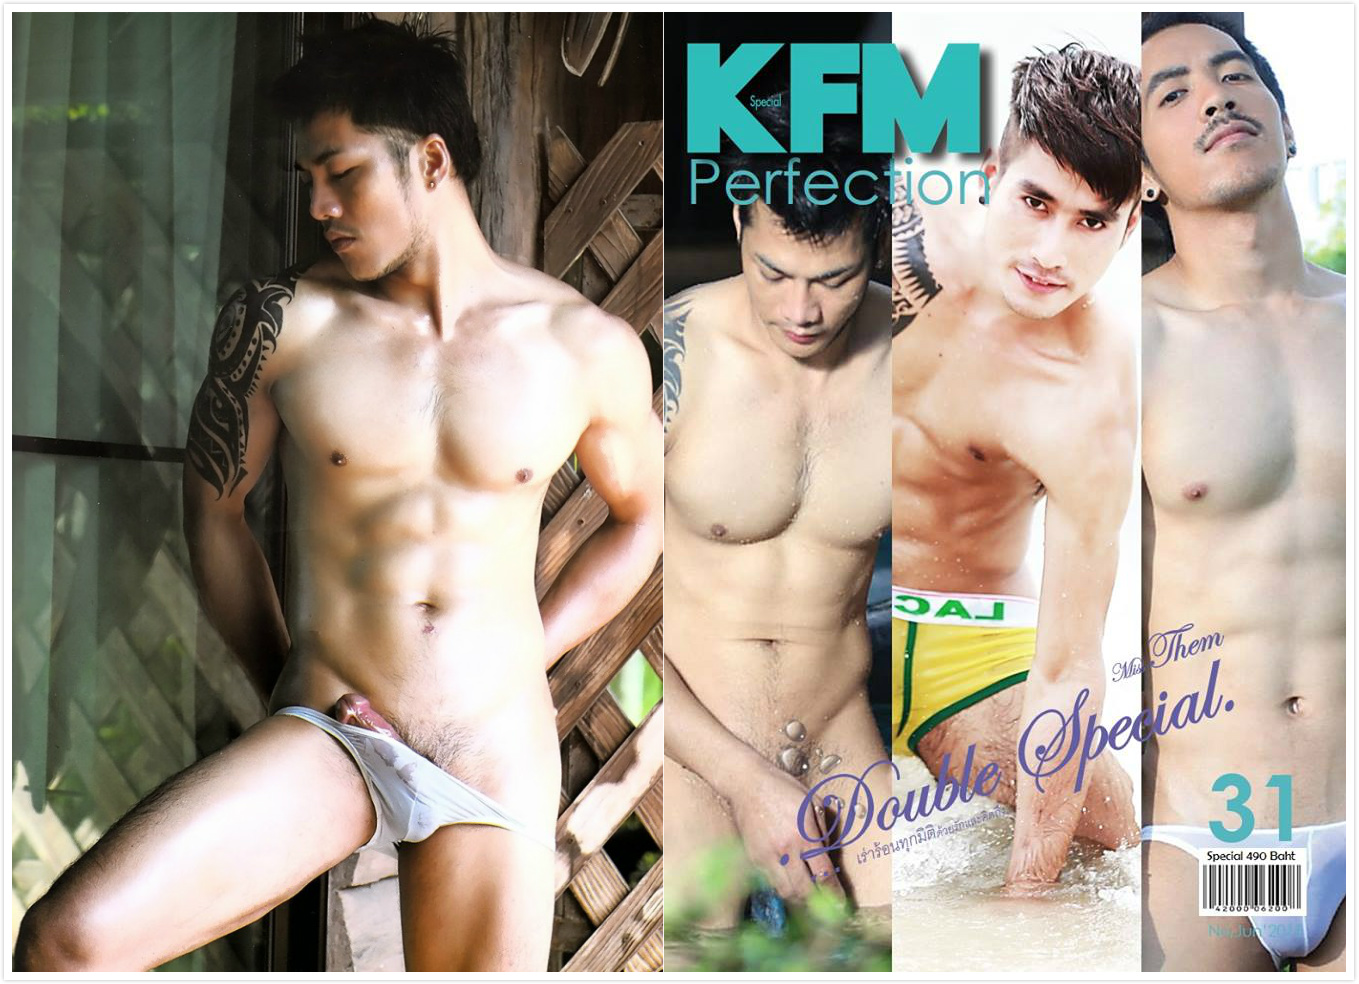 KFM SPECIAL 31